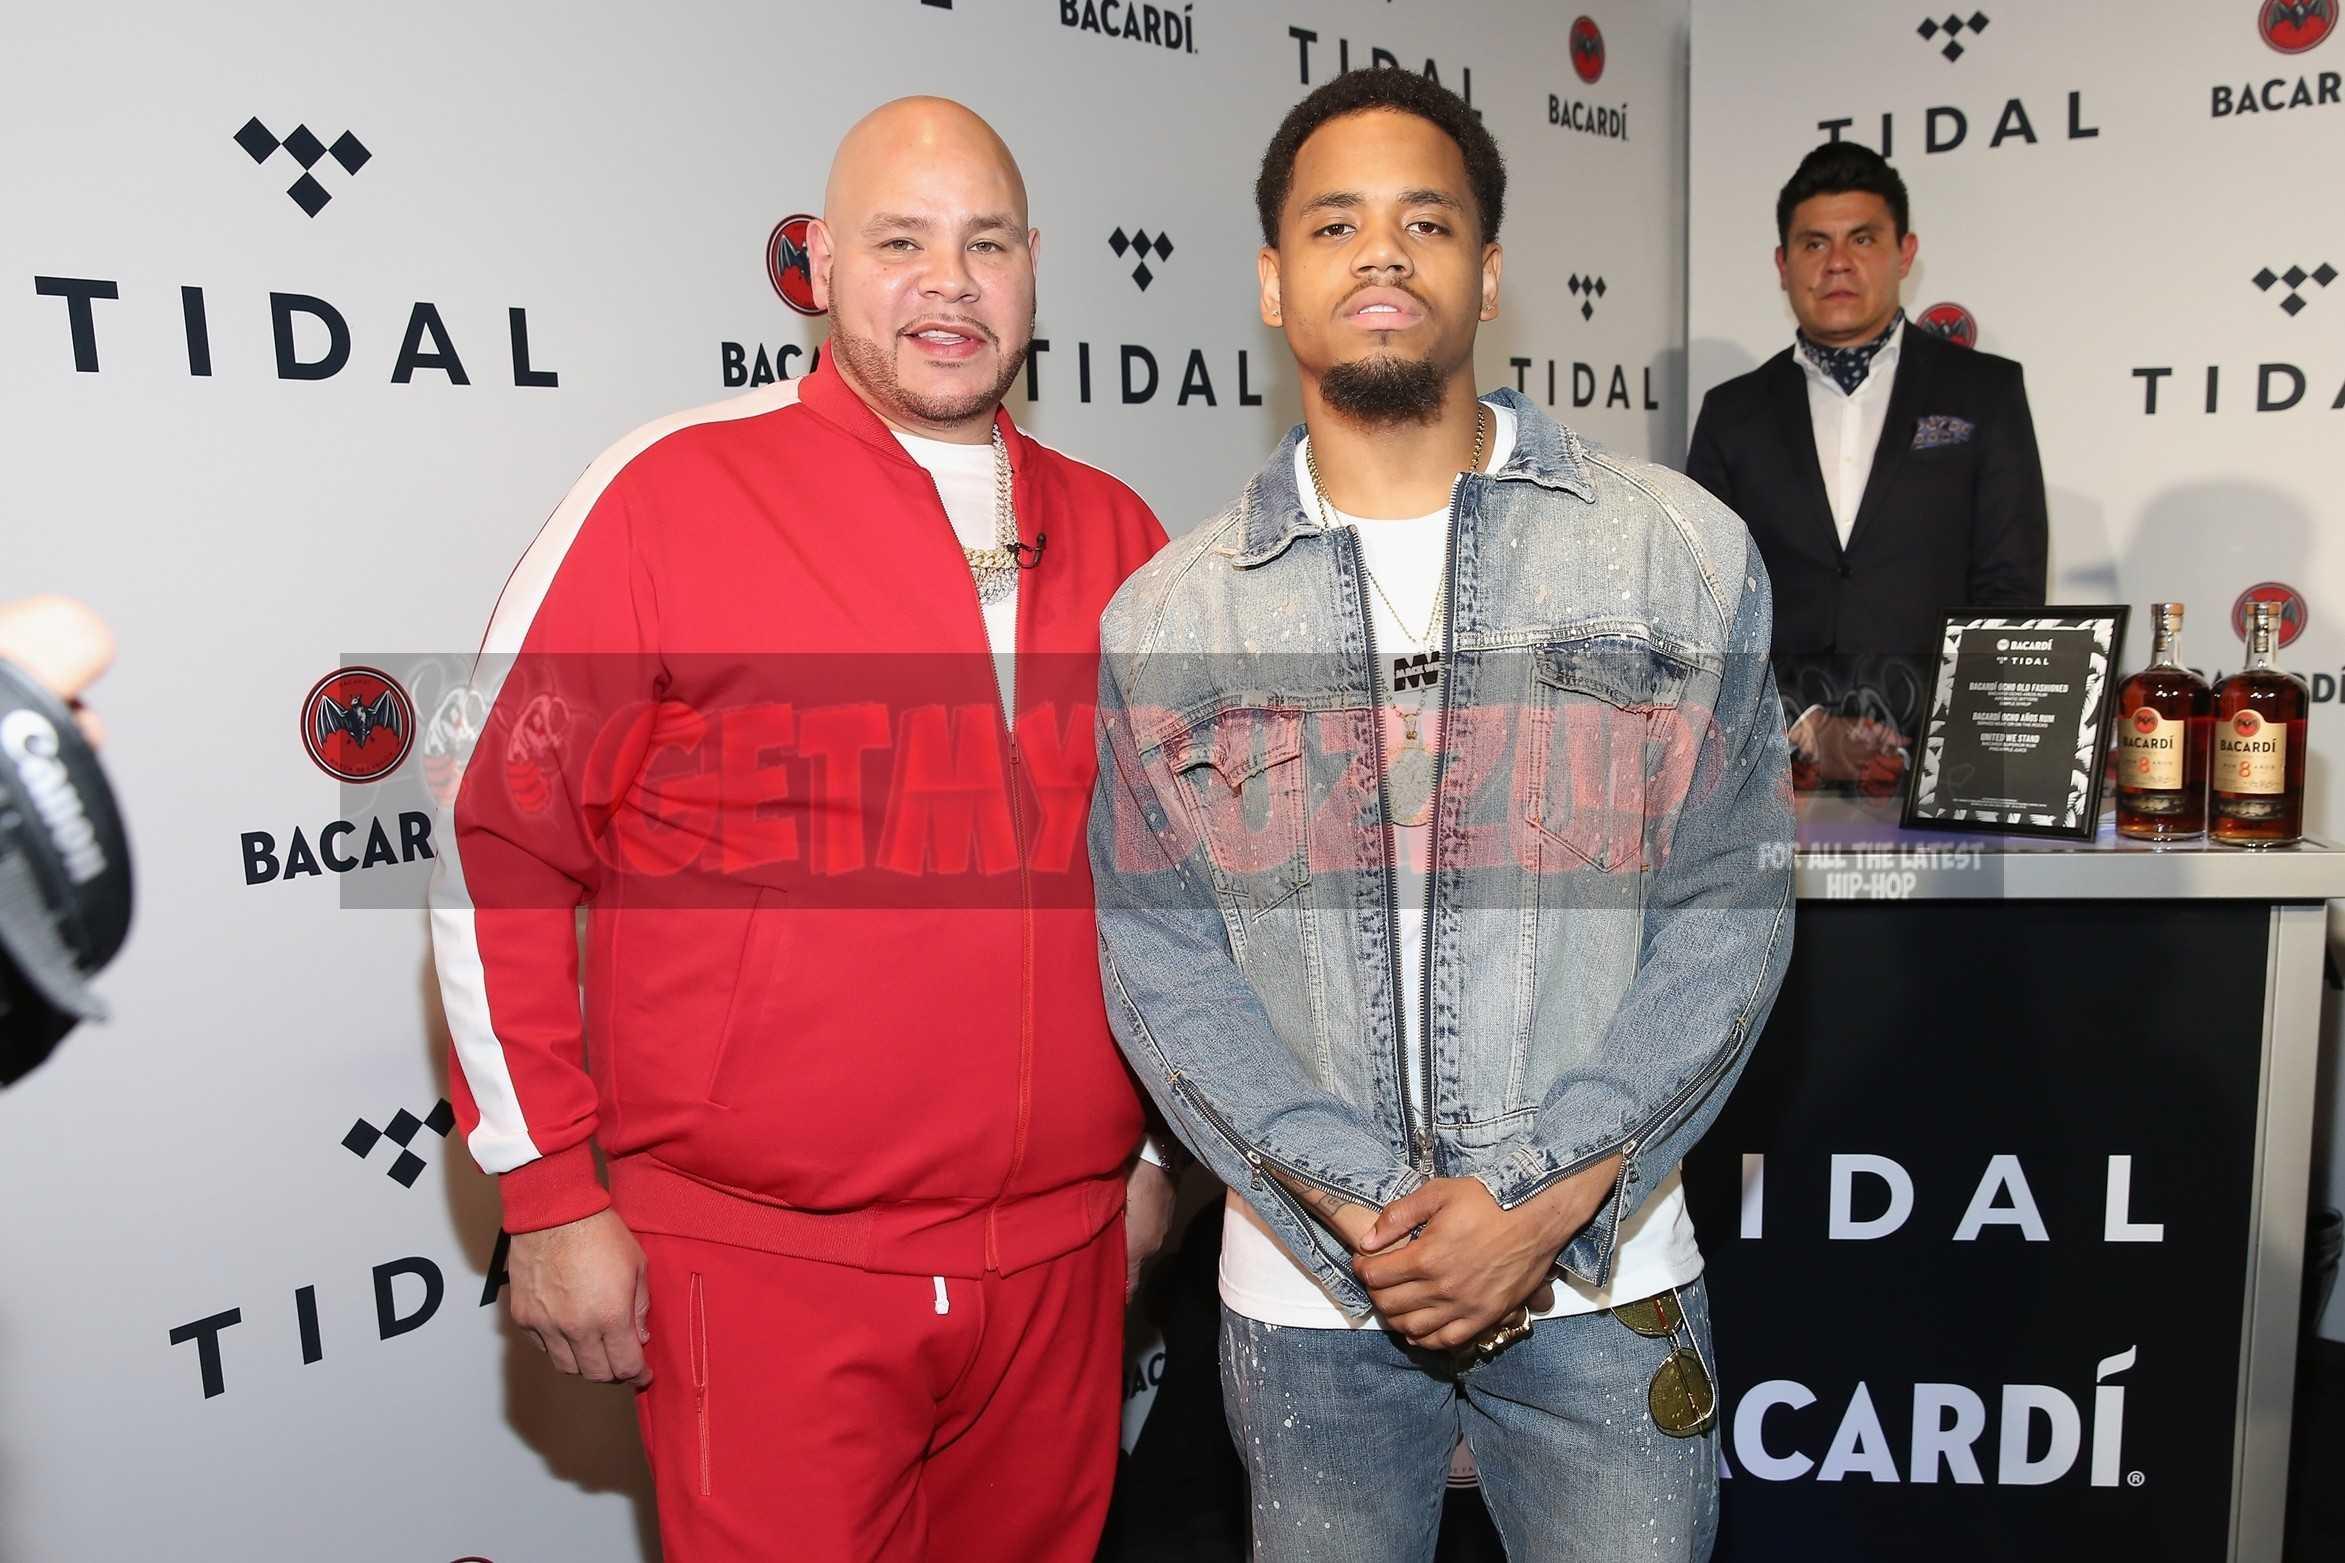 JAY-Z, Jennifer Lopez, Stevie Wonder, DJ Khaled, Kaskade, Chris Brown and More Perform at 3rd Annual TIDAL X: Brooklyn Presented by BACARDÍ